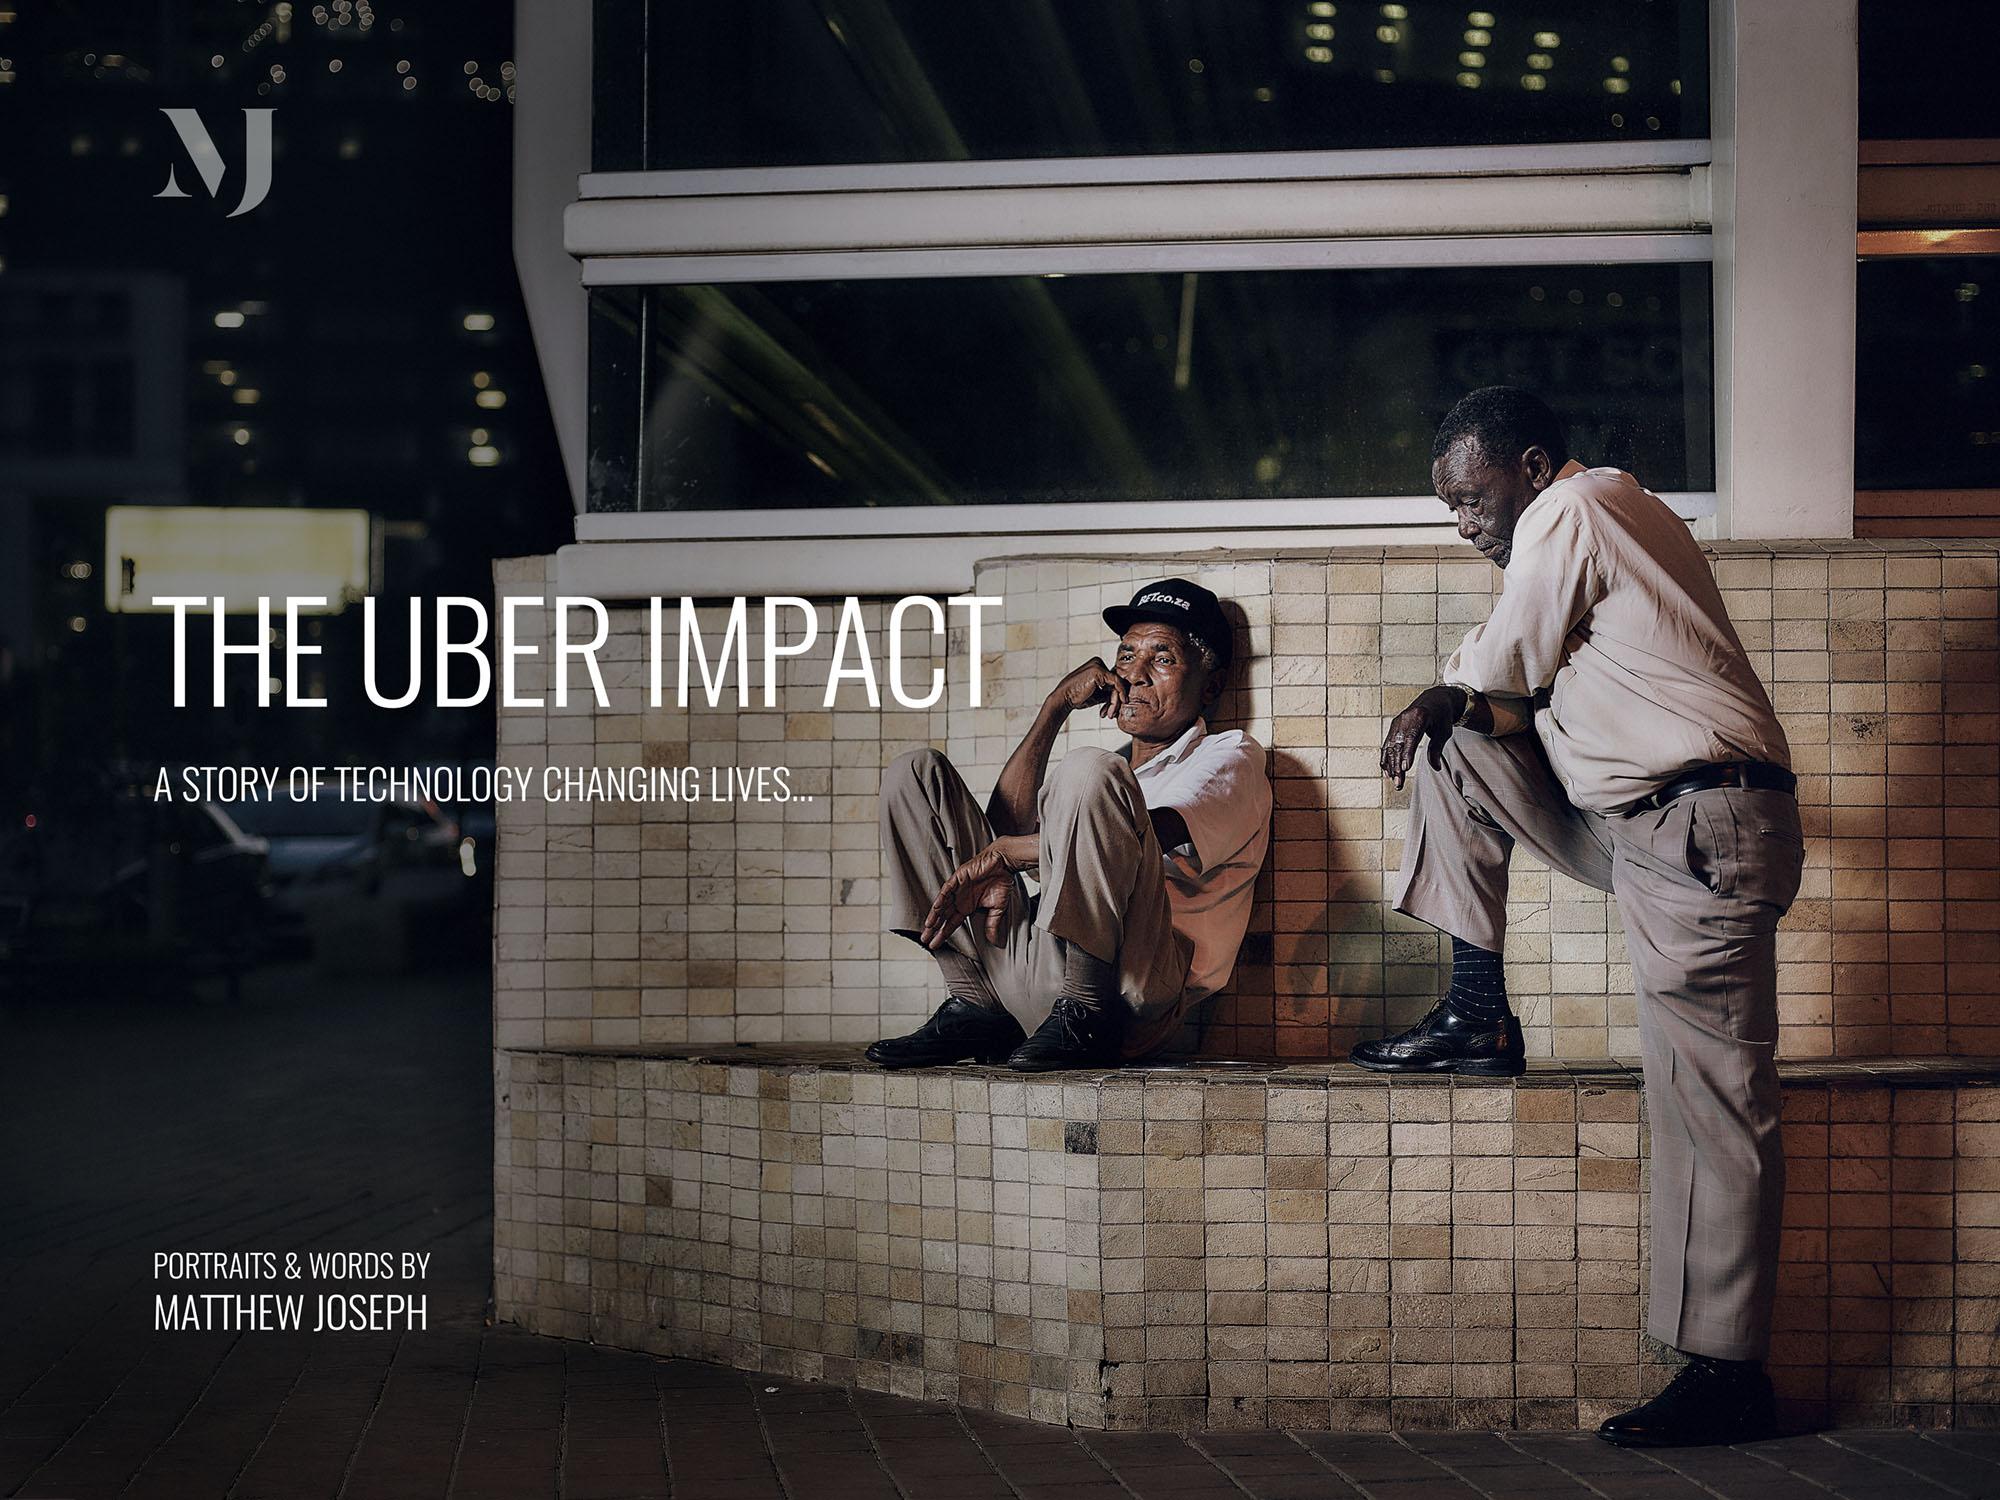 The Uber Impact by Matthew Joseph